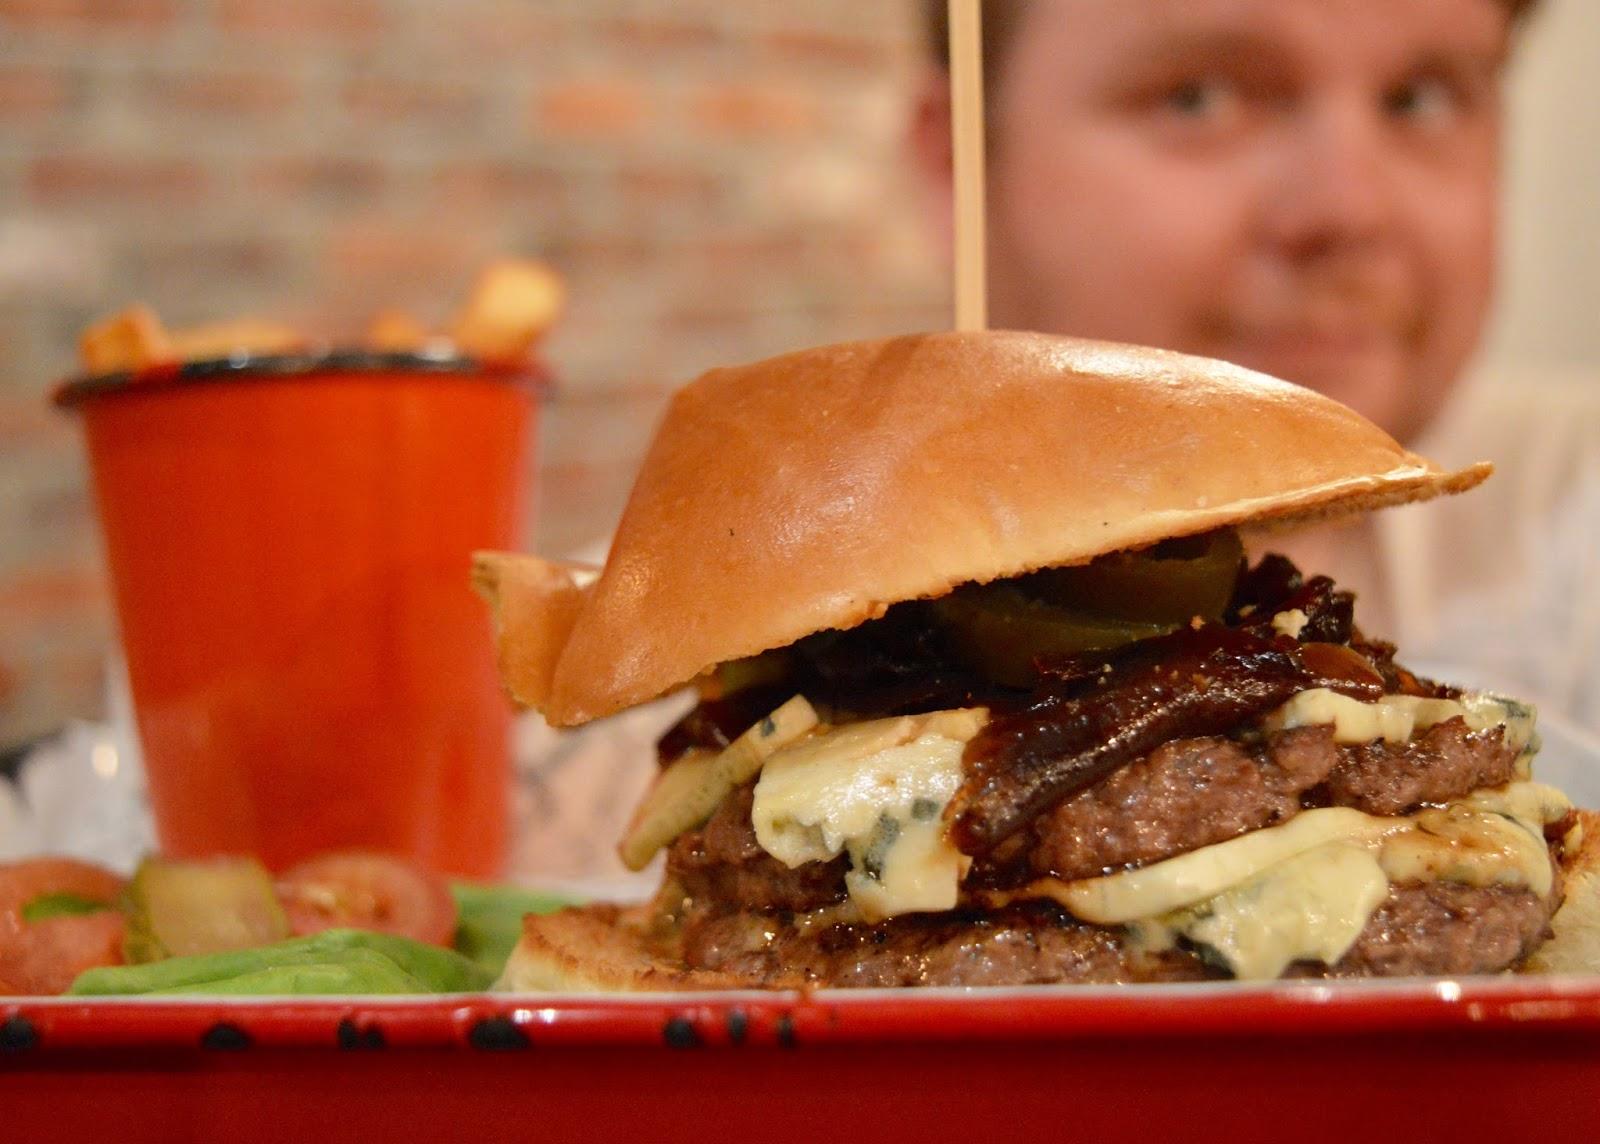 Top 10 Child Friendly Restaurants in Newcastle City Centre - Fat Hippo Underground